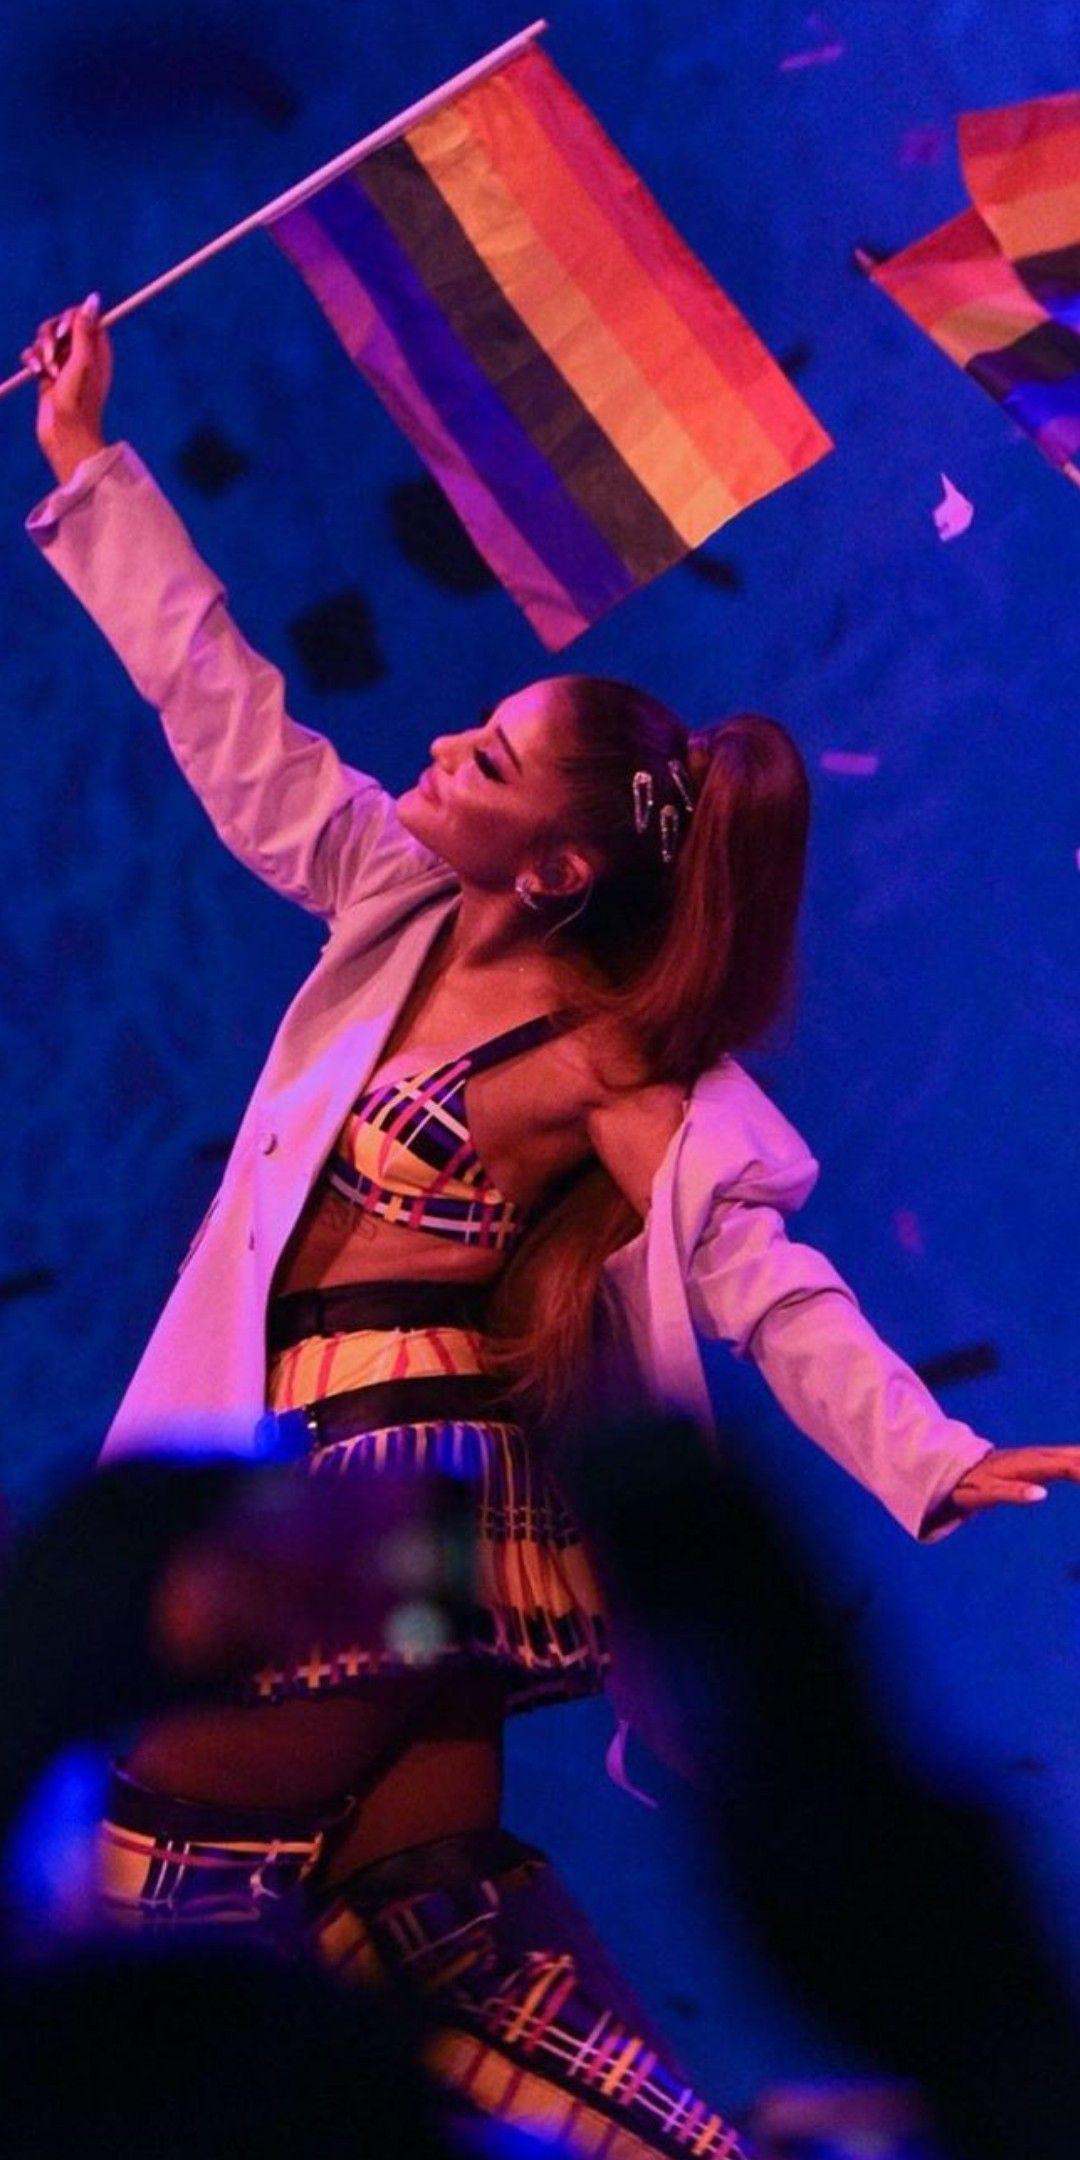 Thank U Next Ariana Grande Wallpaper Ariana Grande Photos Ariana Grande Michelle rodriguez s w t photos hot